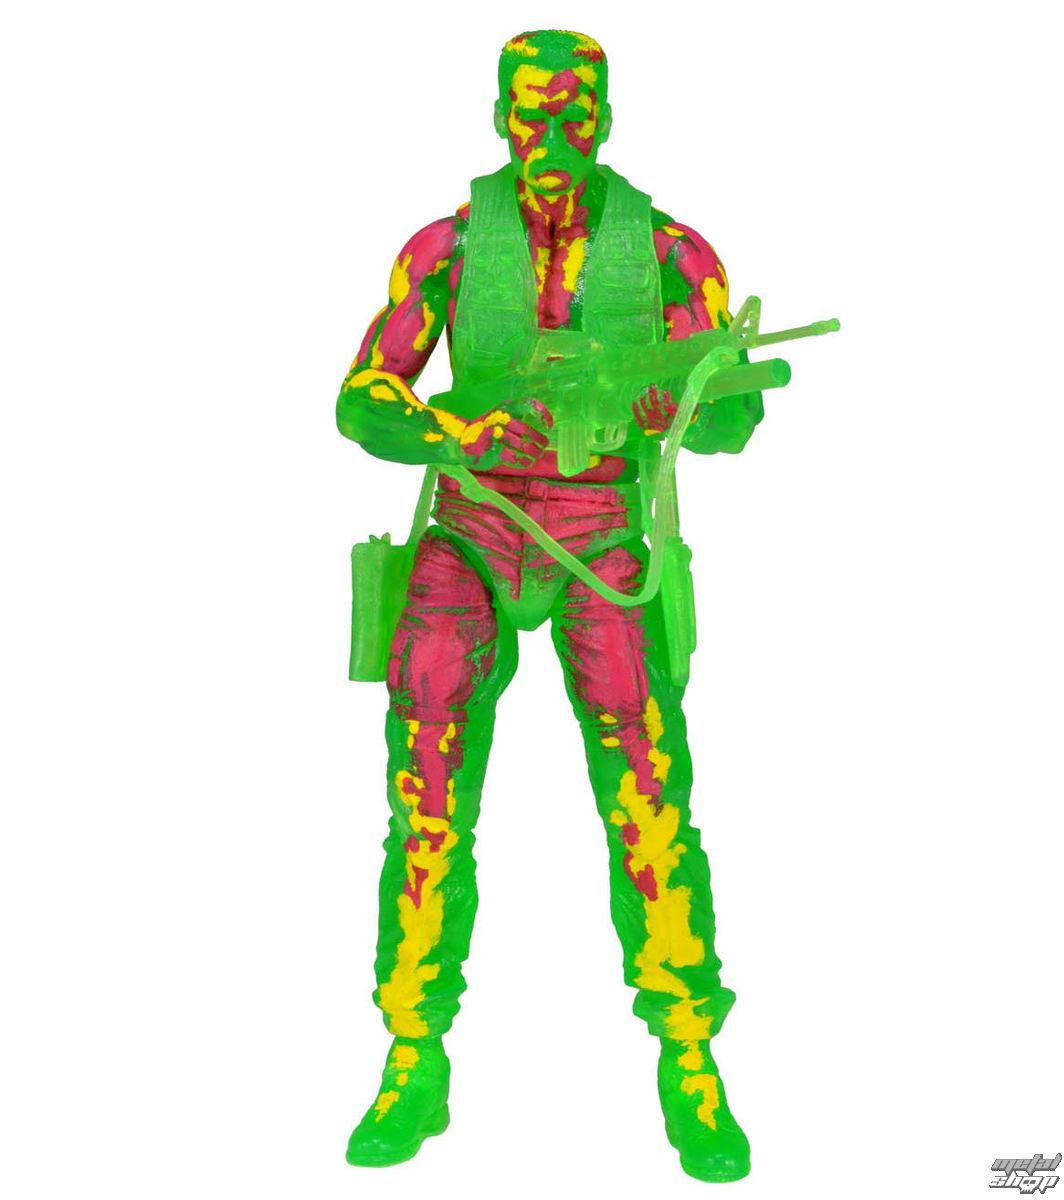 figurka Predator 2 - Thermal Vision Dutch - NECA51498